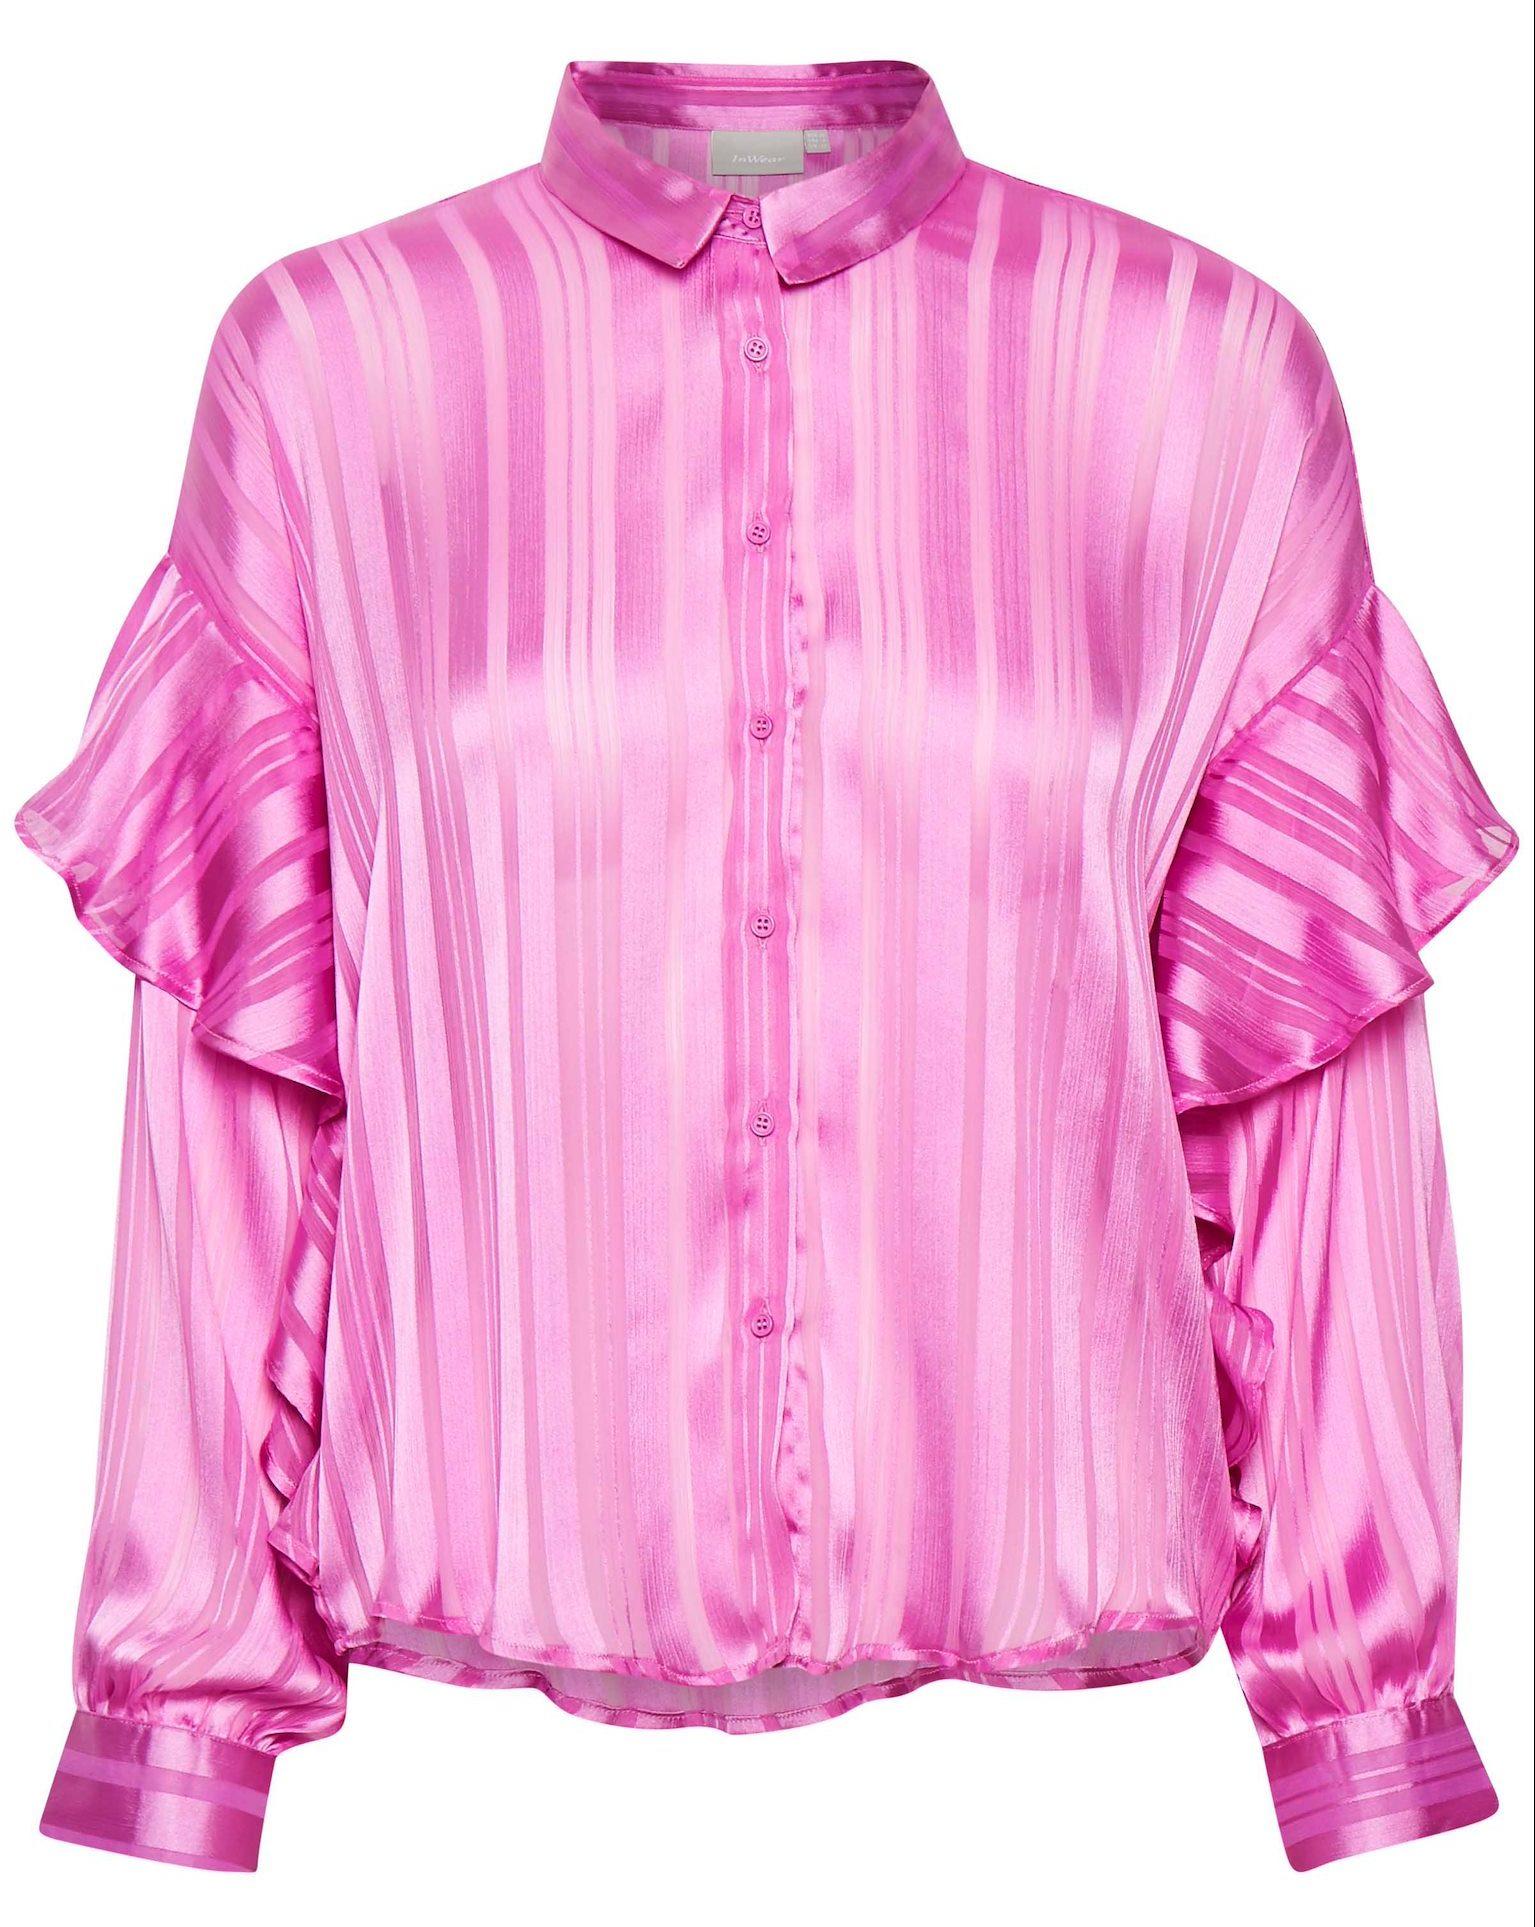 Pink skjorte, InWear, lyserød. (Foto: InWear)